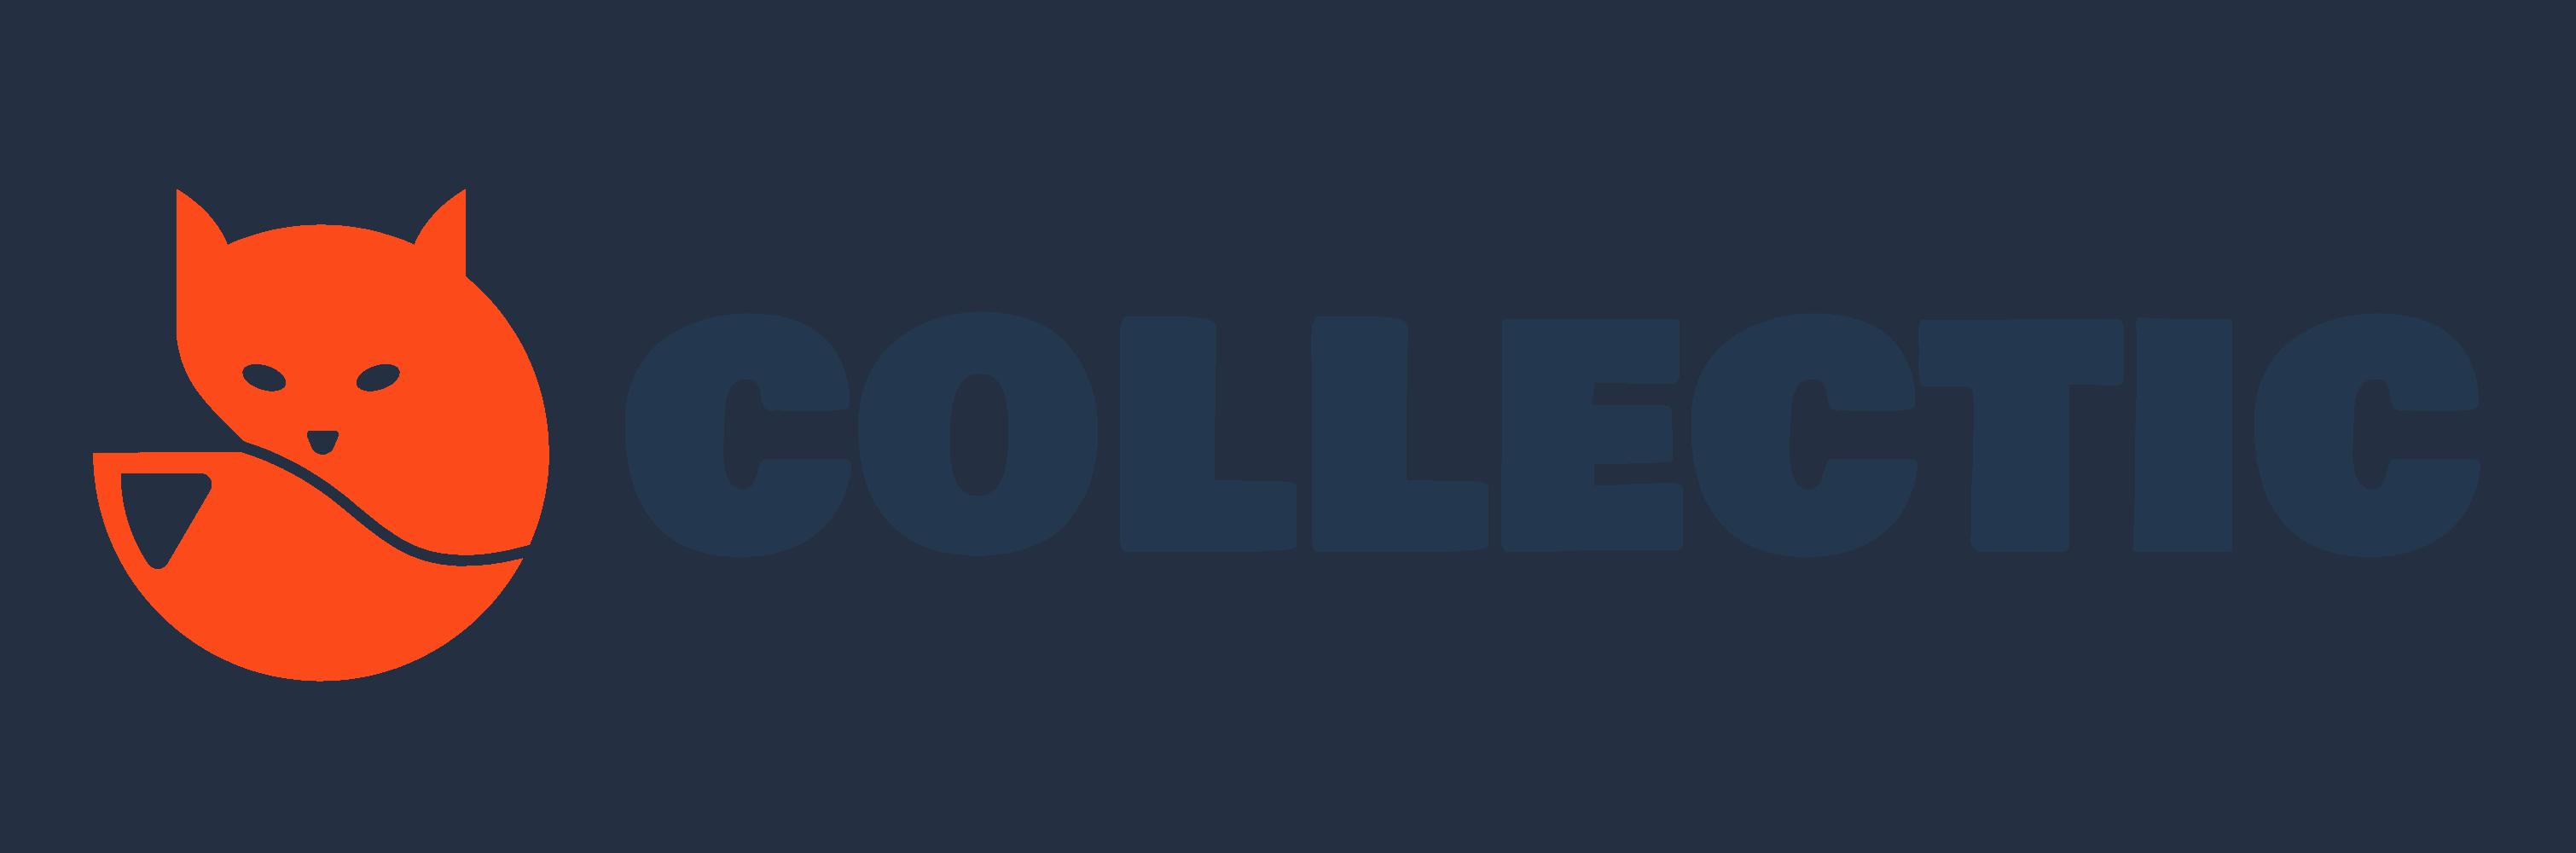 Collectic Logo - Orange Blue